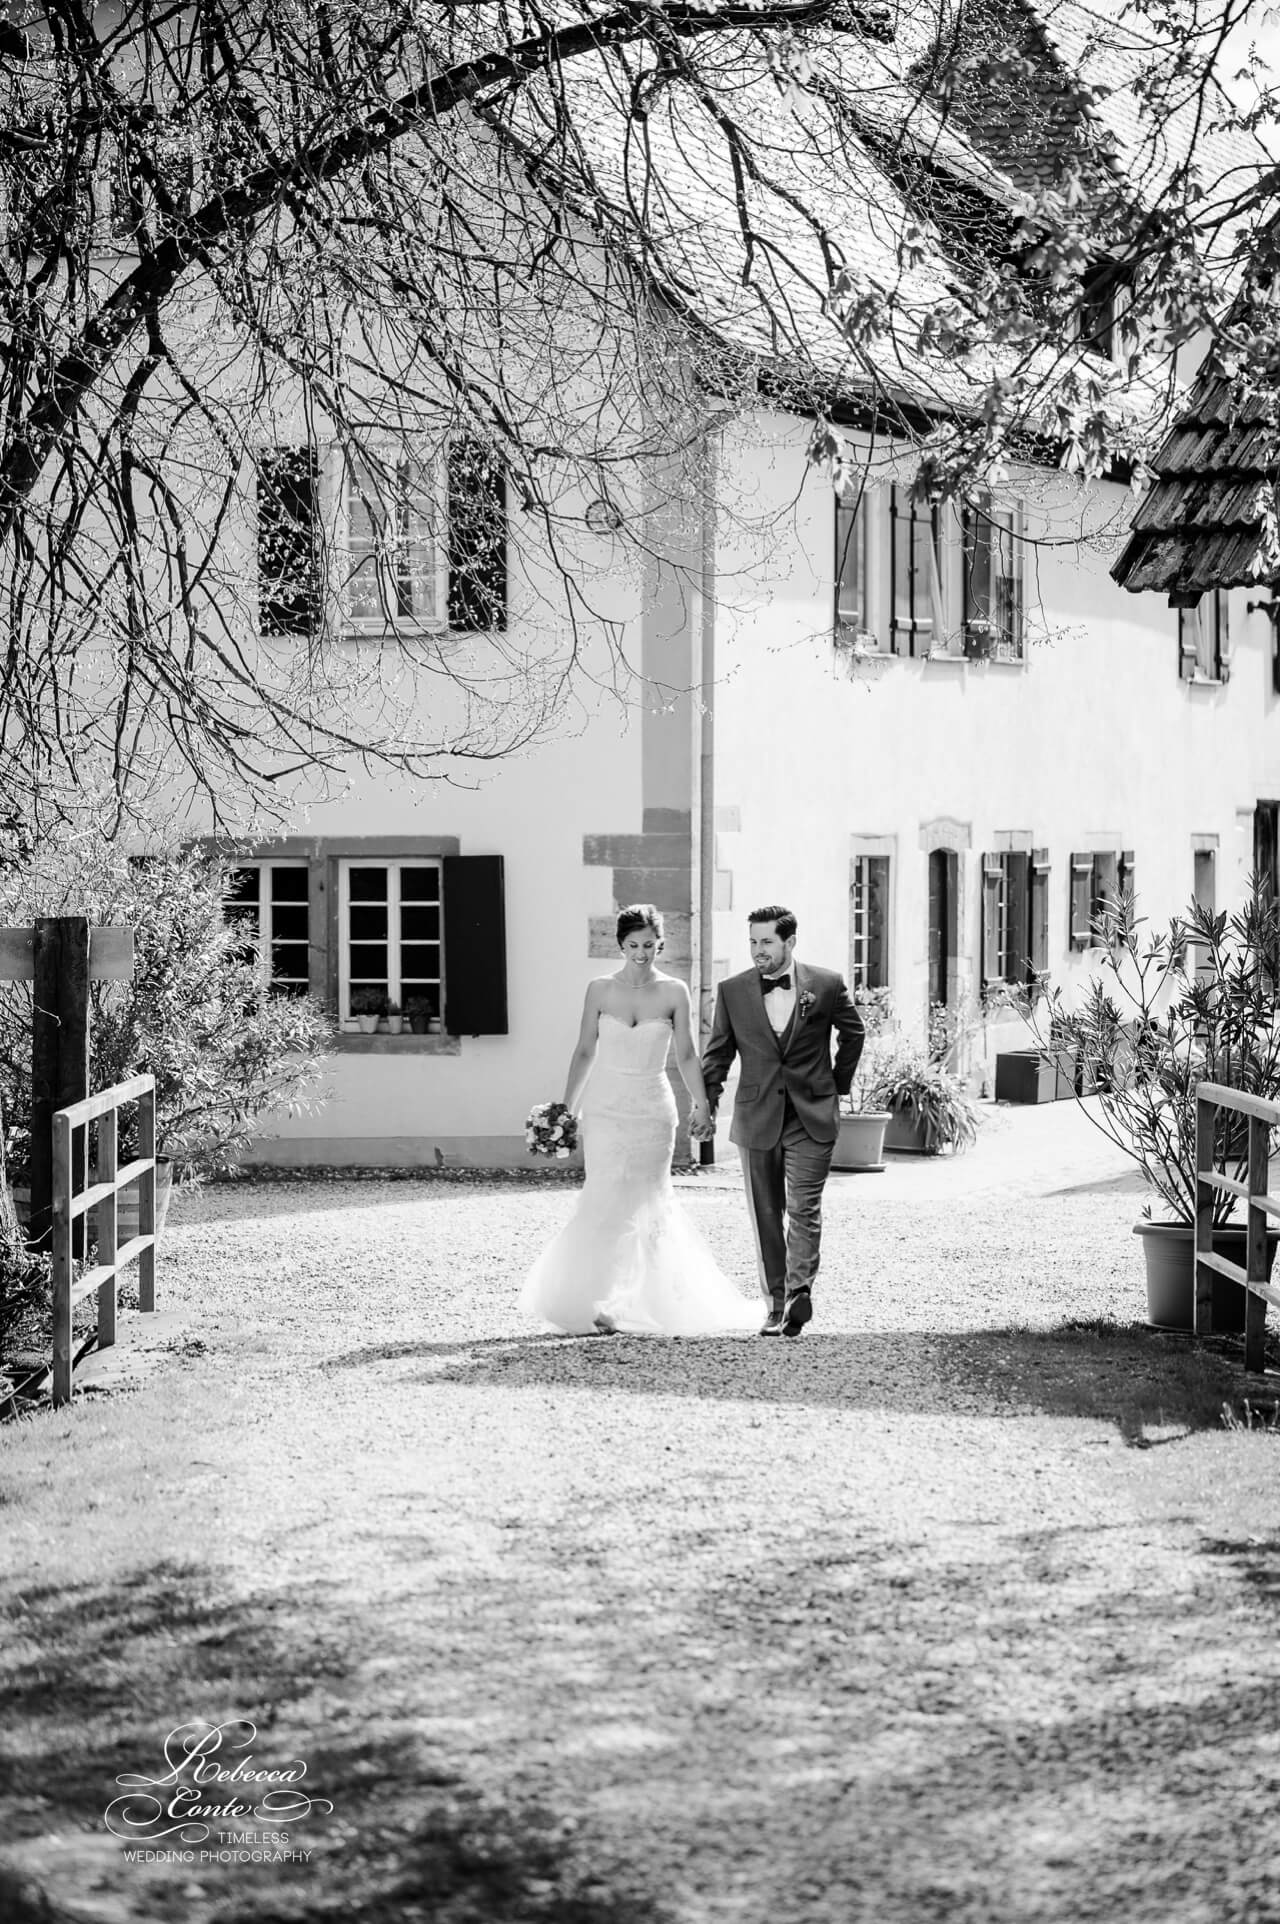 Rebecca Conte Fotografie: Freie Trauung Steinbachhof 28